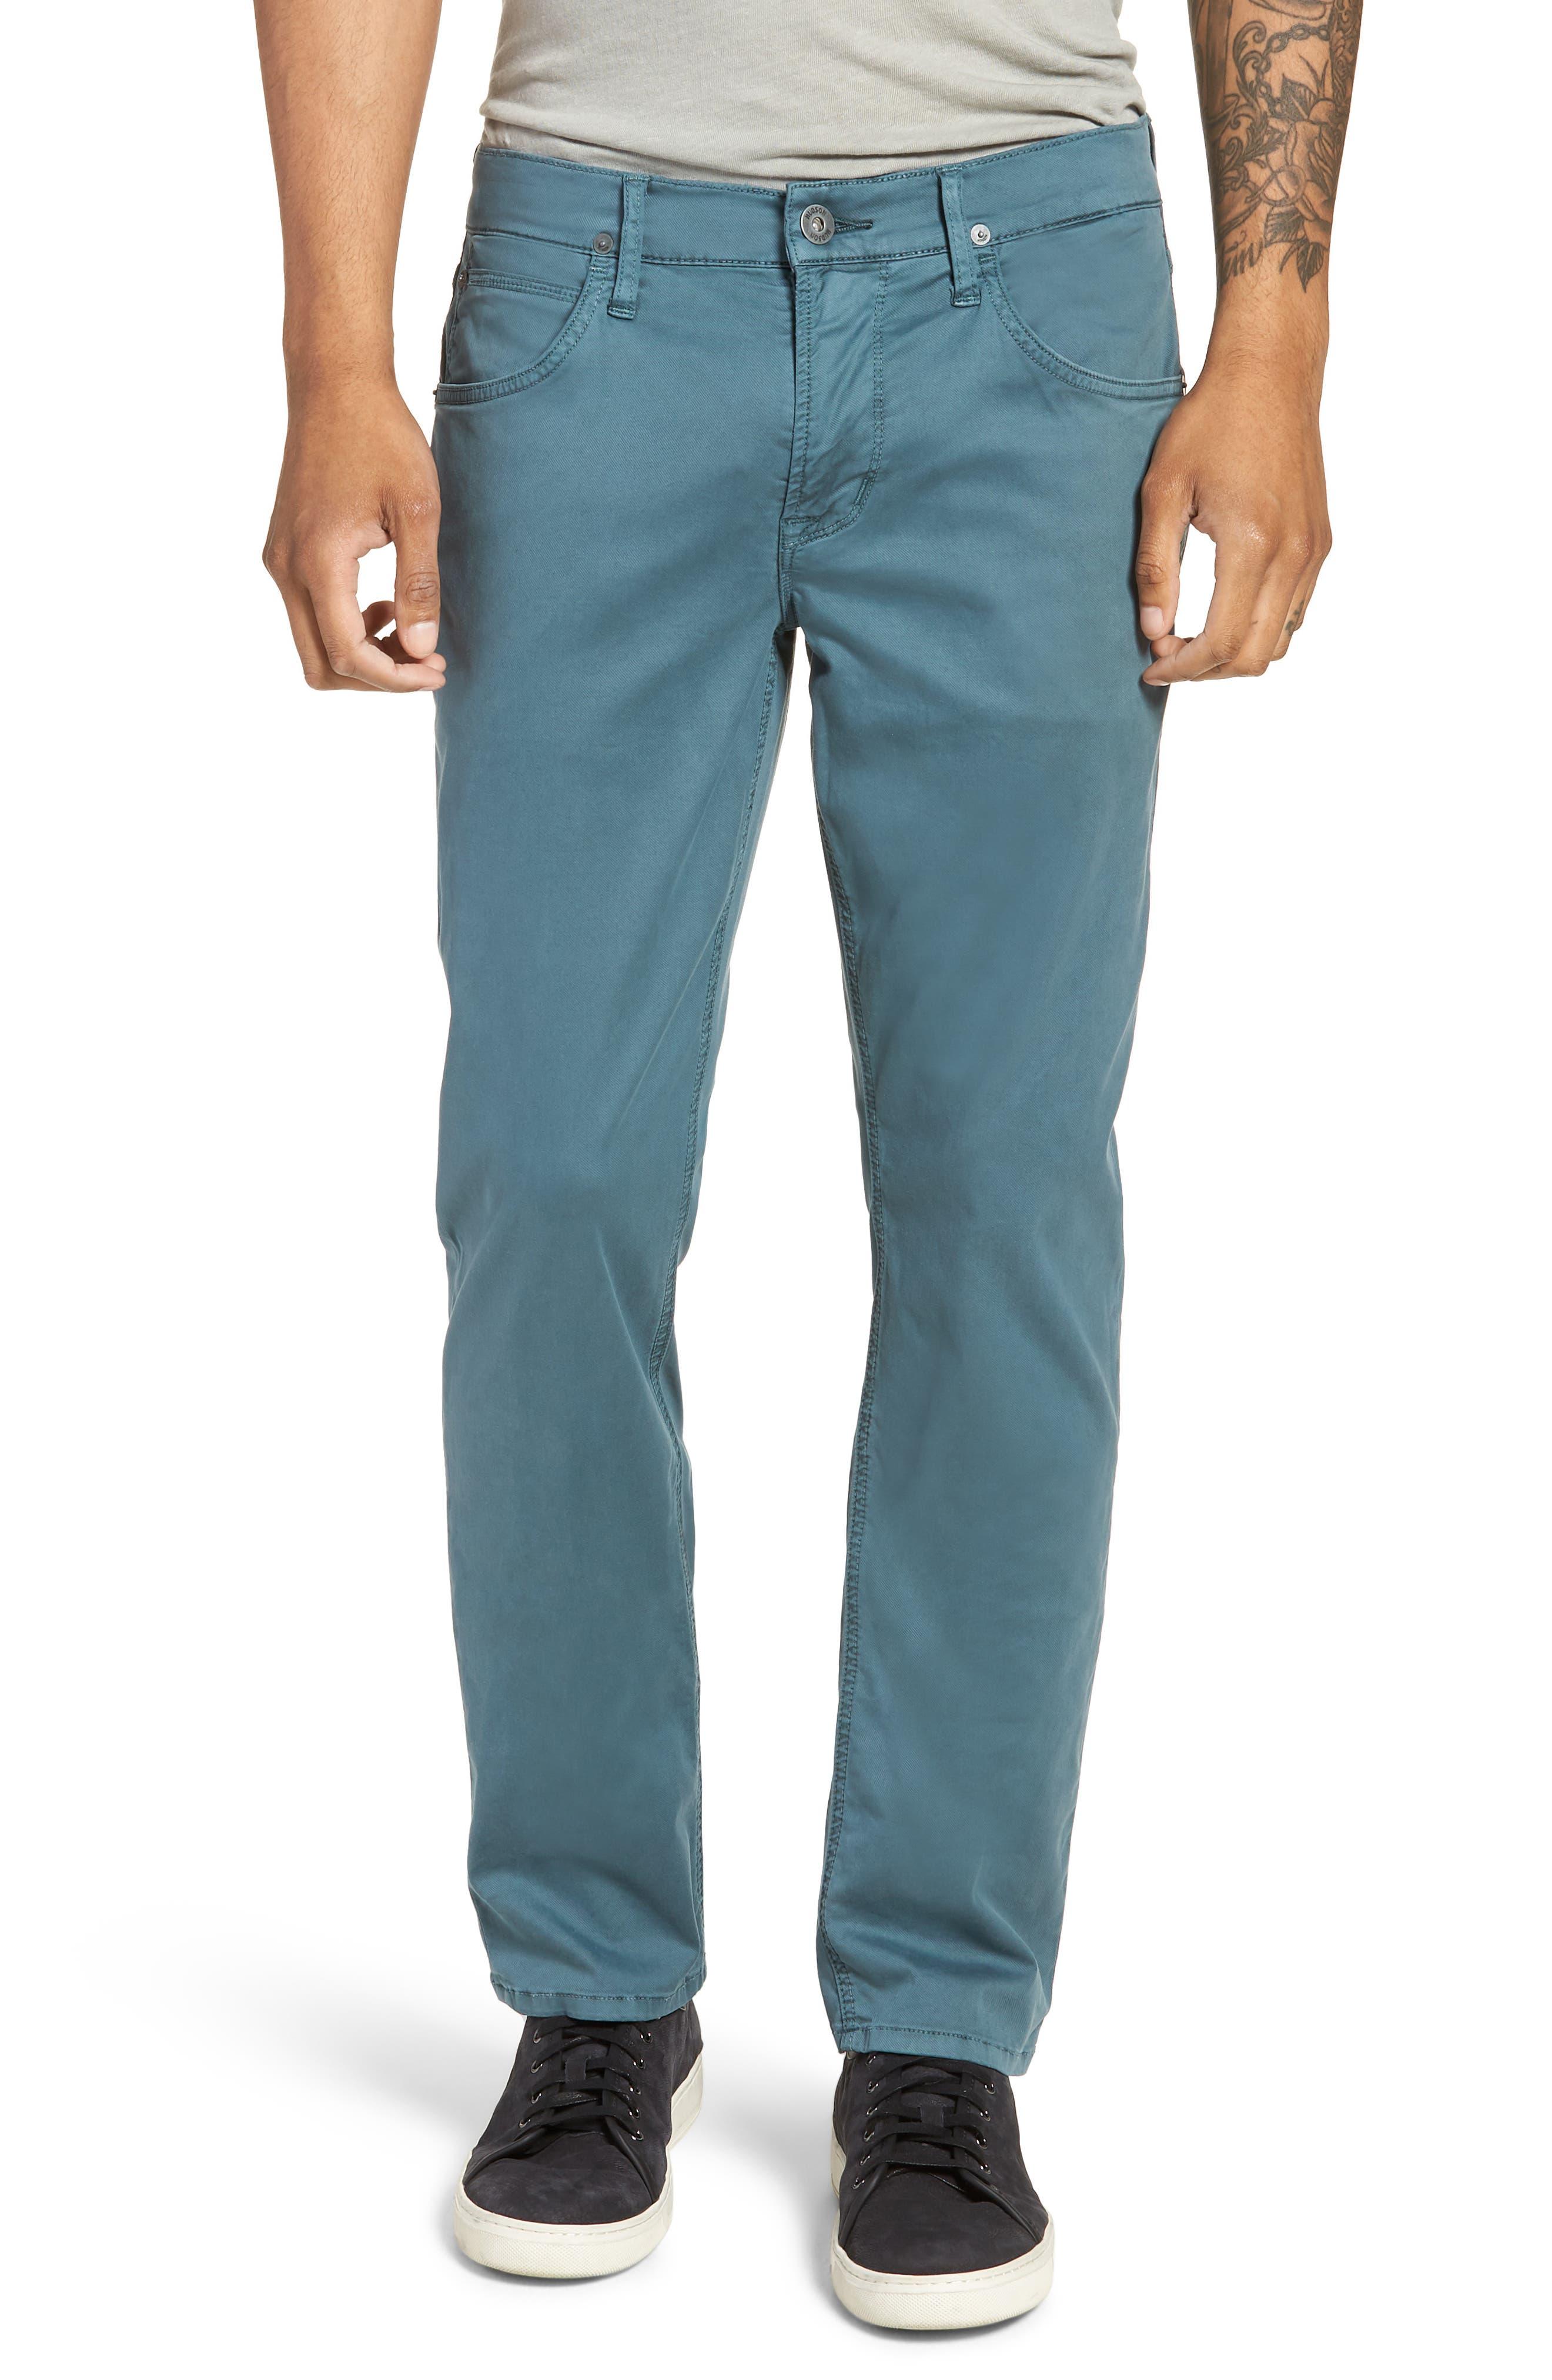 Blake Slim Fit Jeans,                             Main thumbnail 1, color,                             497